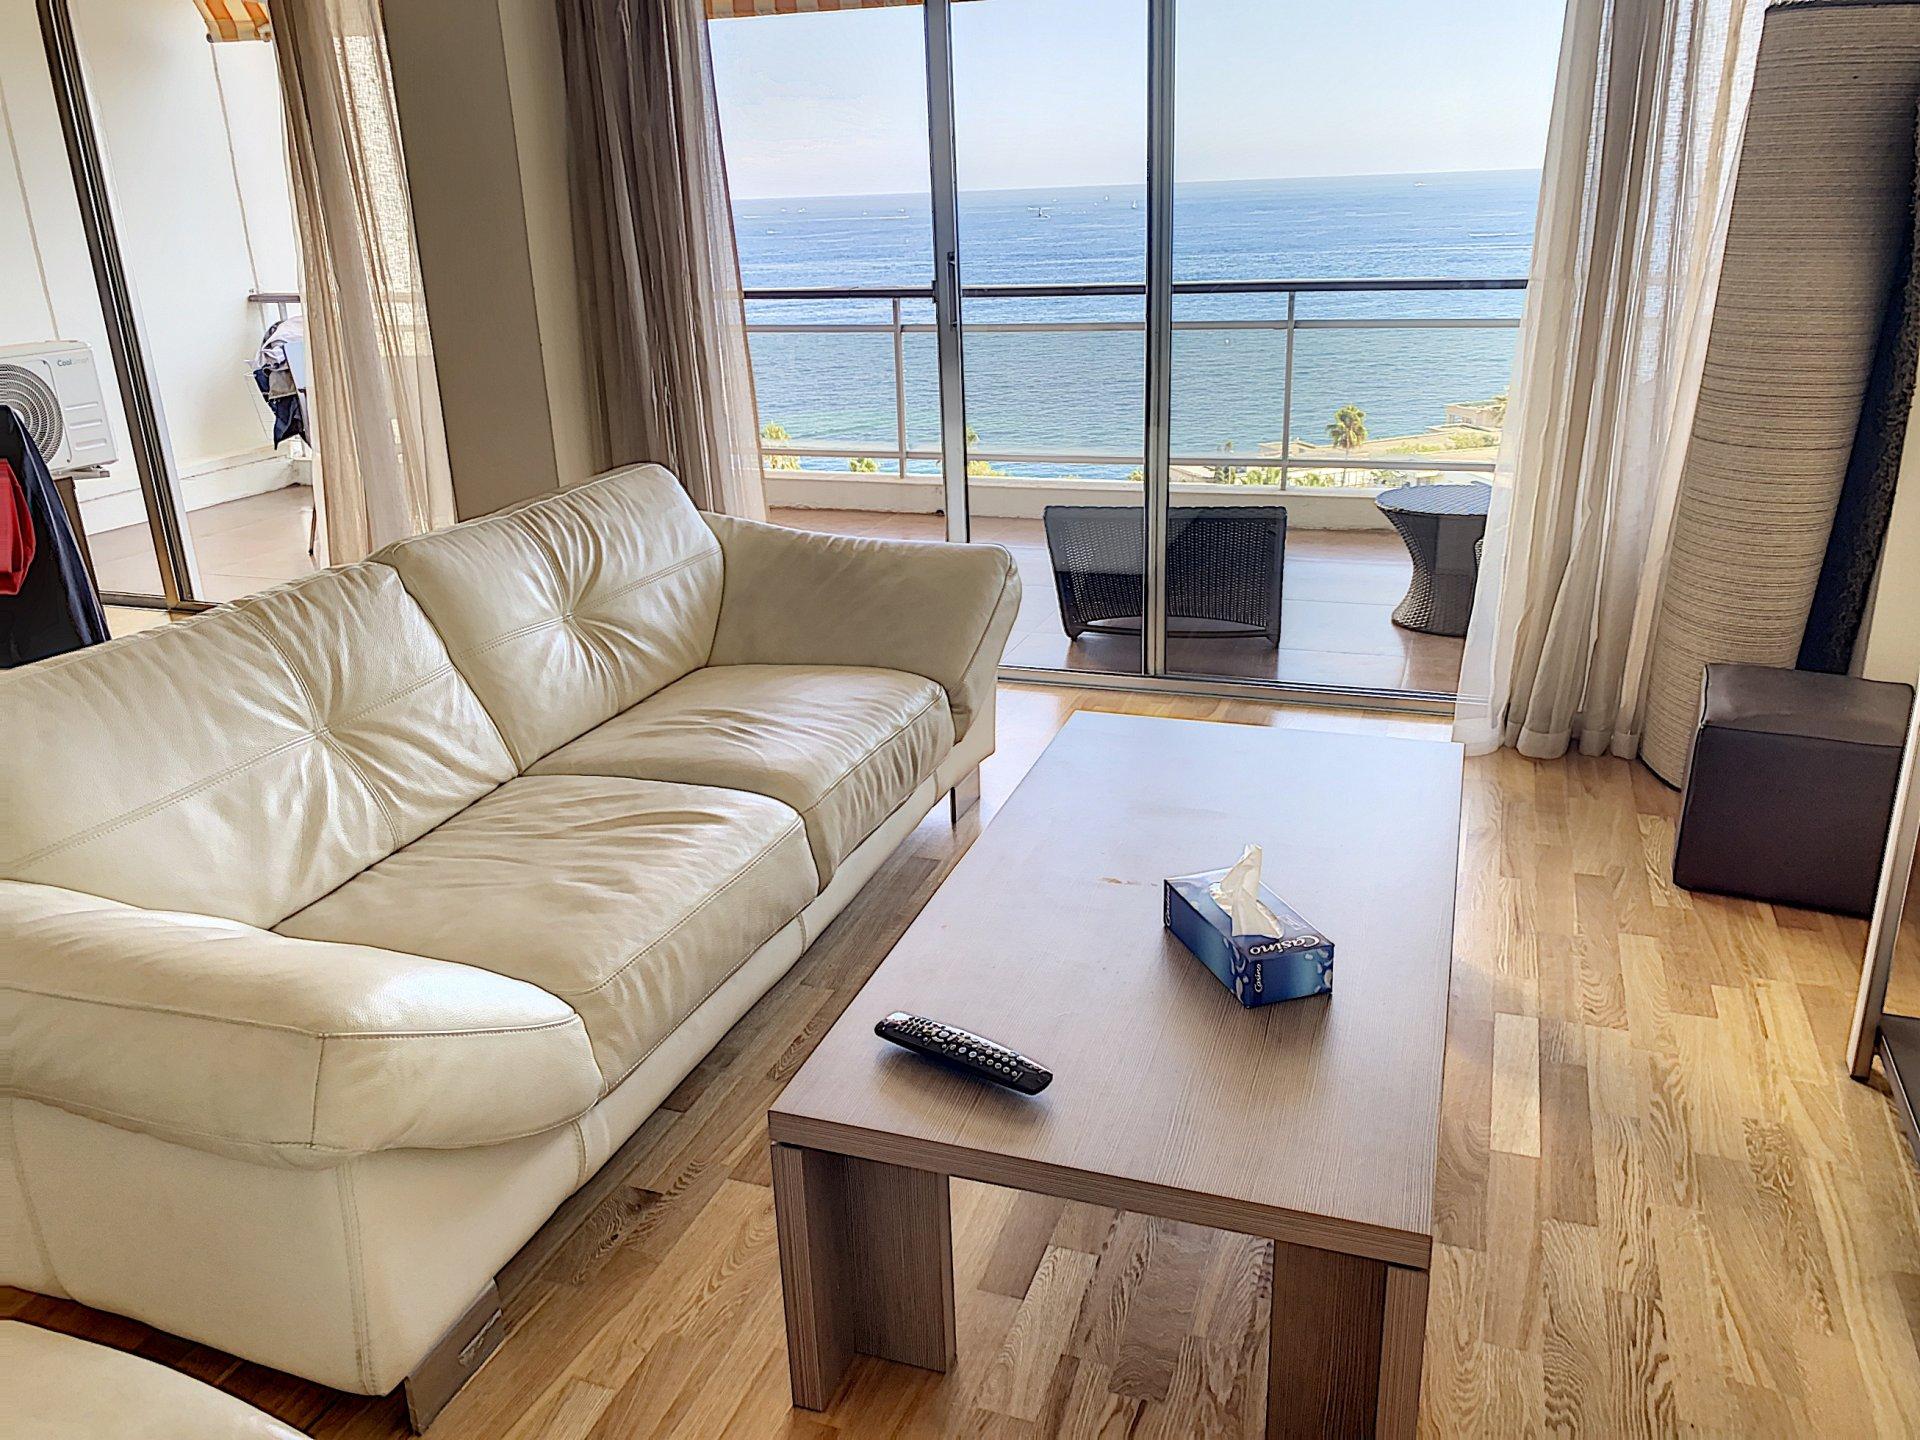 Cannes Californie 3p 88 m2 panoramic view